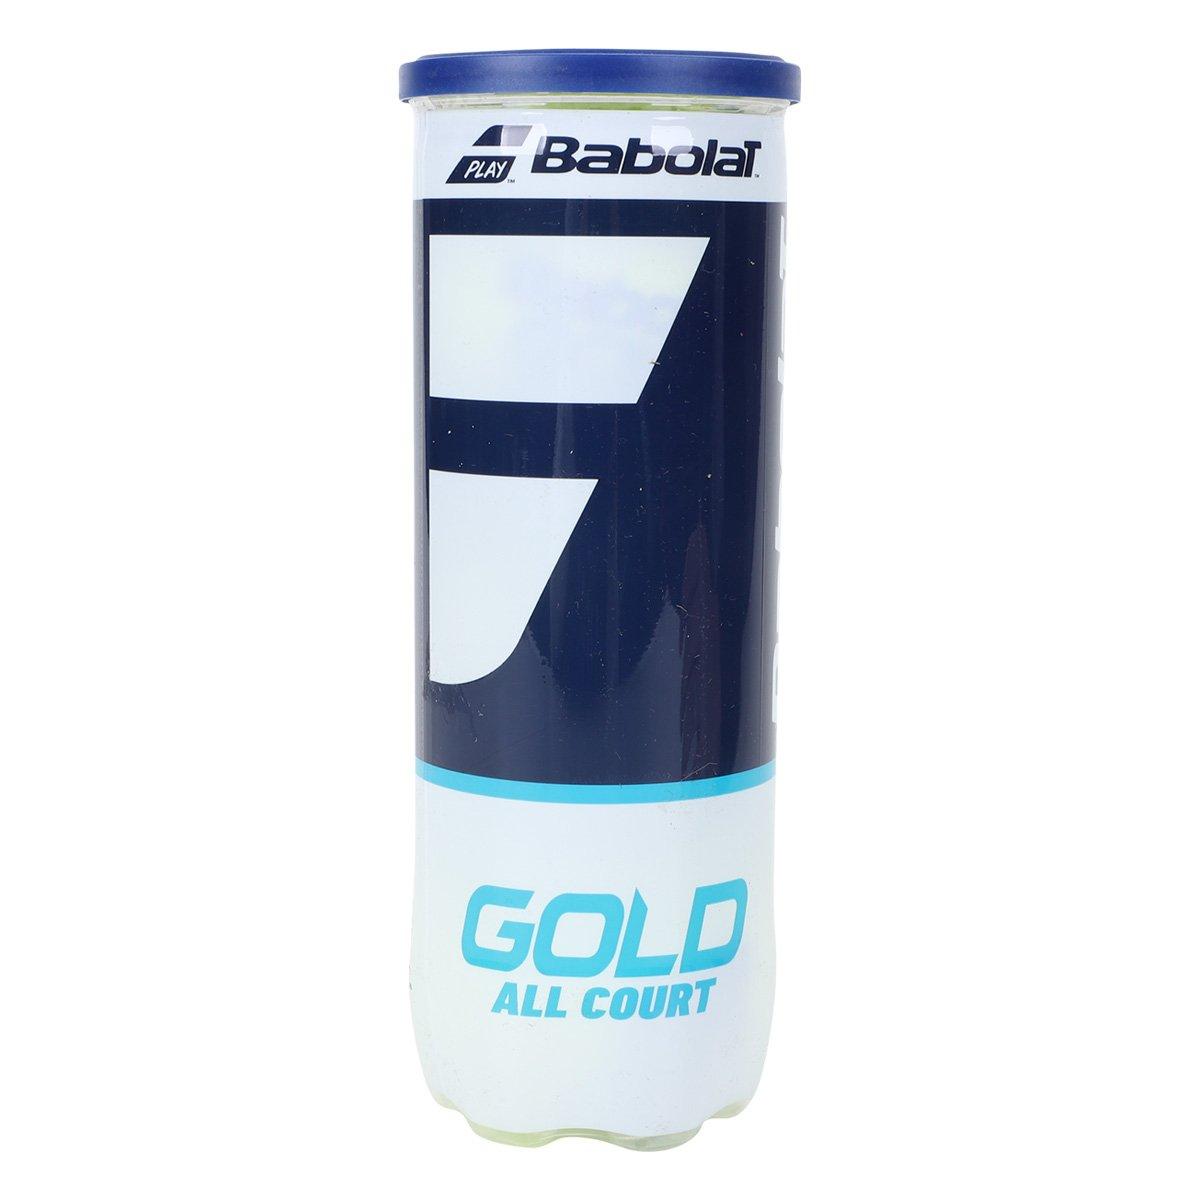 Bola de Tenis Babolat GOLD ALL Court